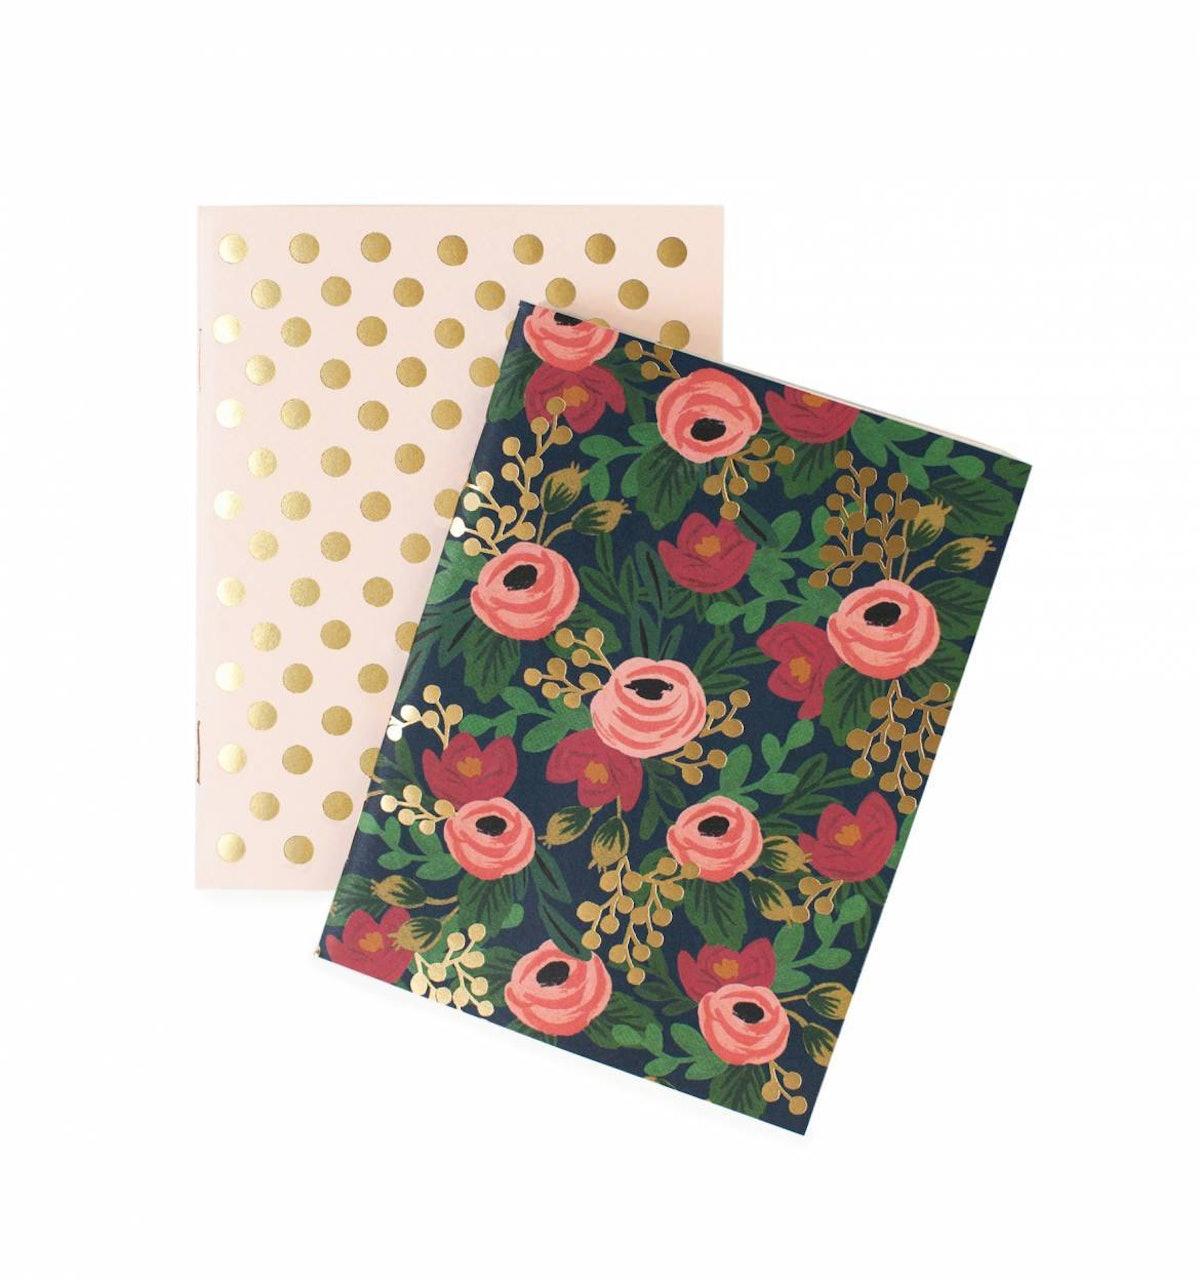 Rosa Pair of Pocket Notebooks